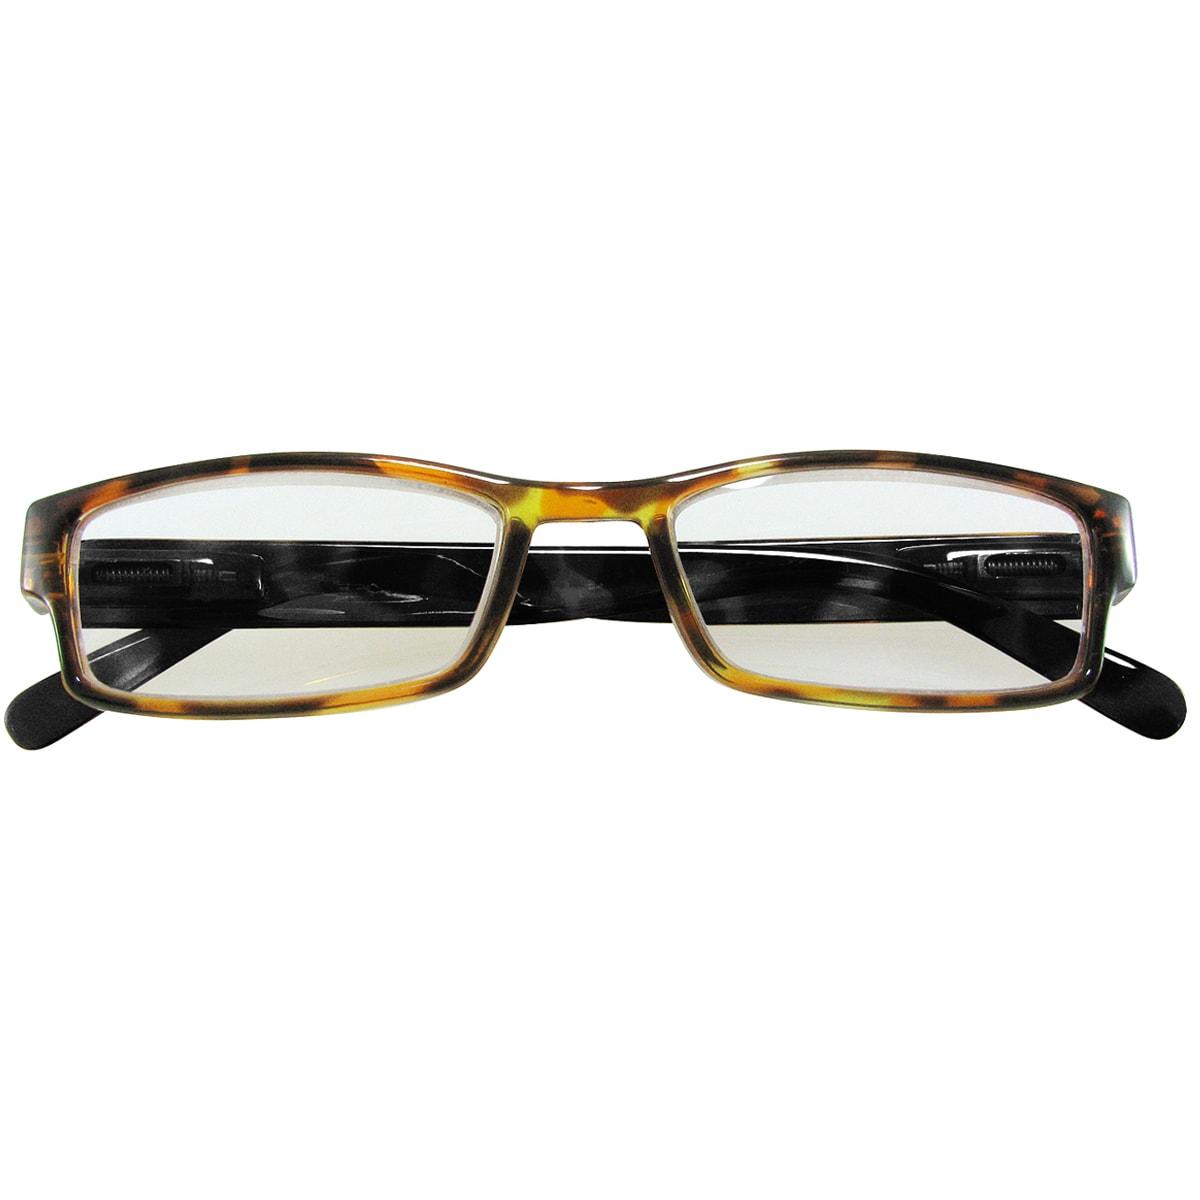 E-specs by Evolutioneyes Tortoise/ black Computer Glasses